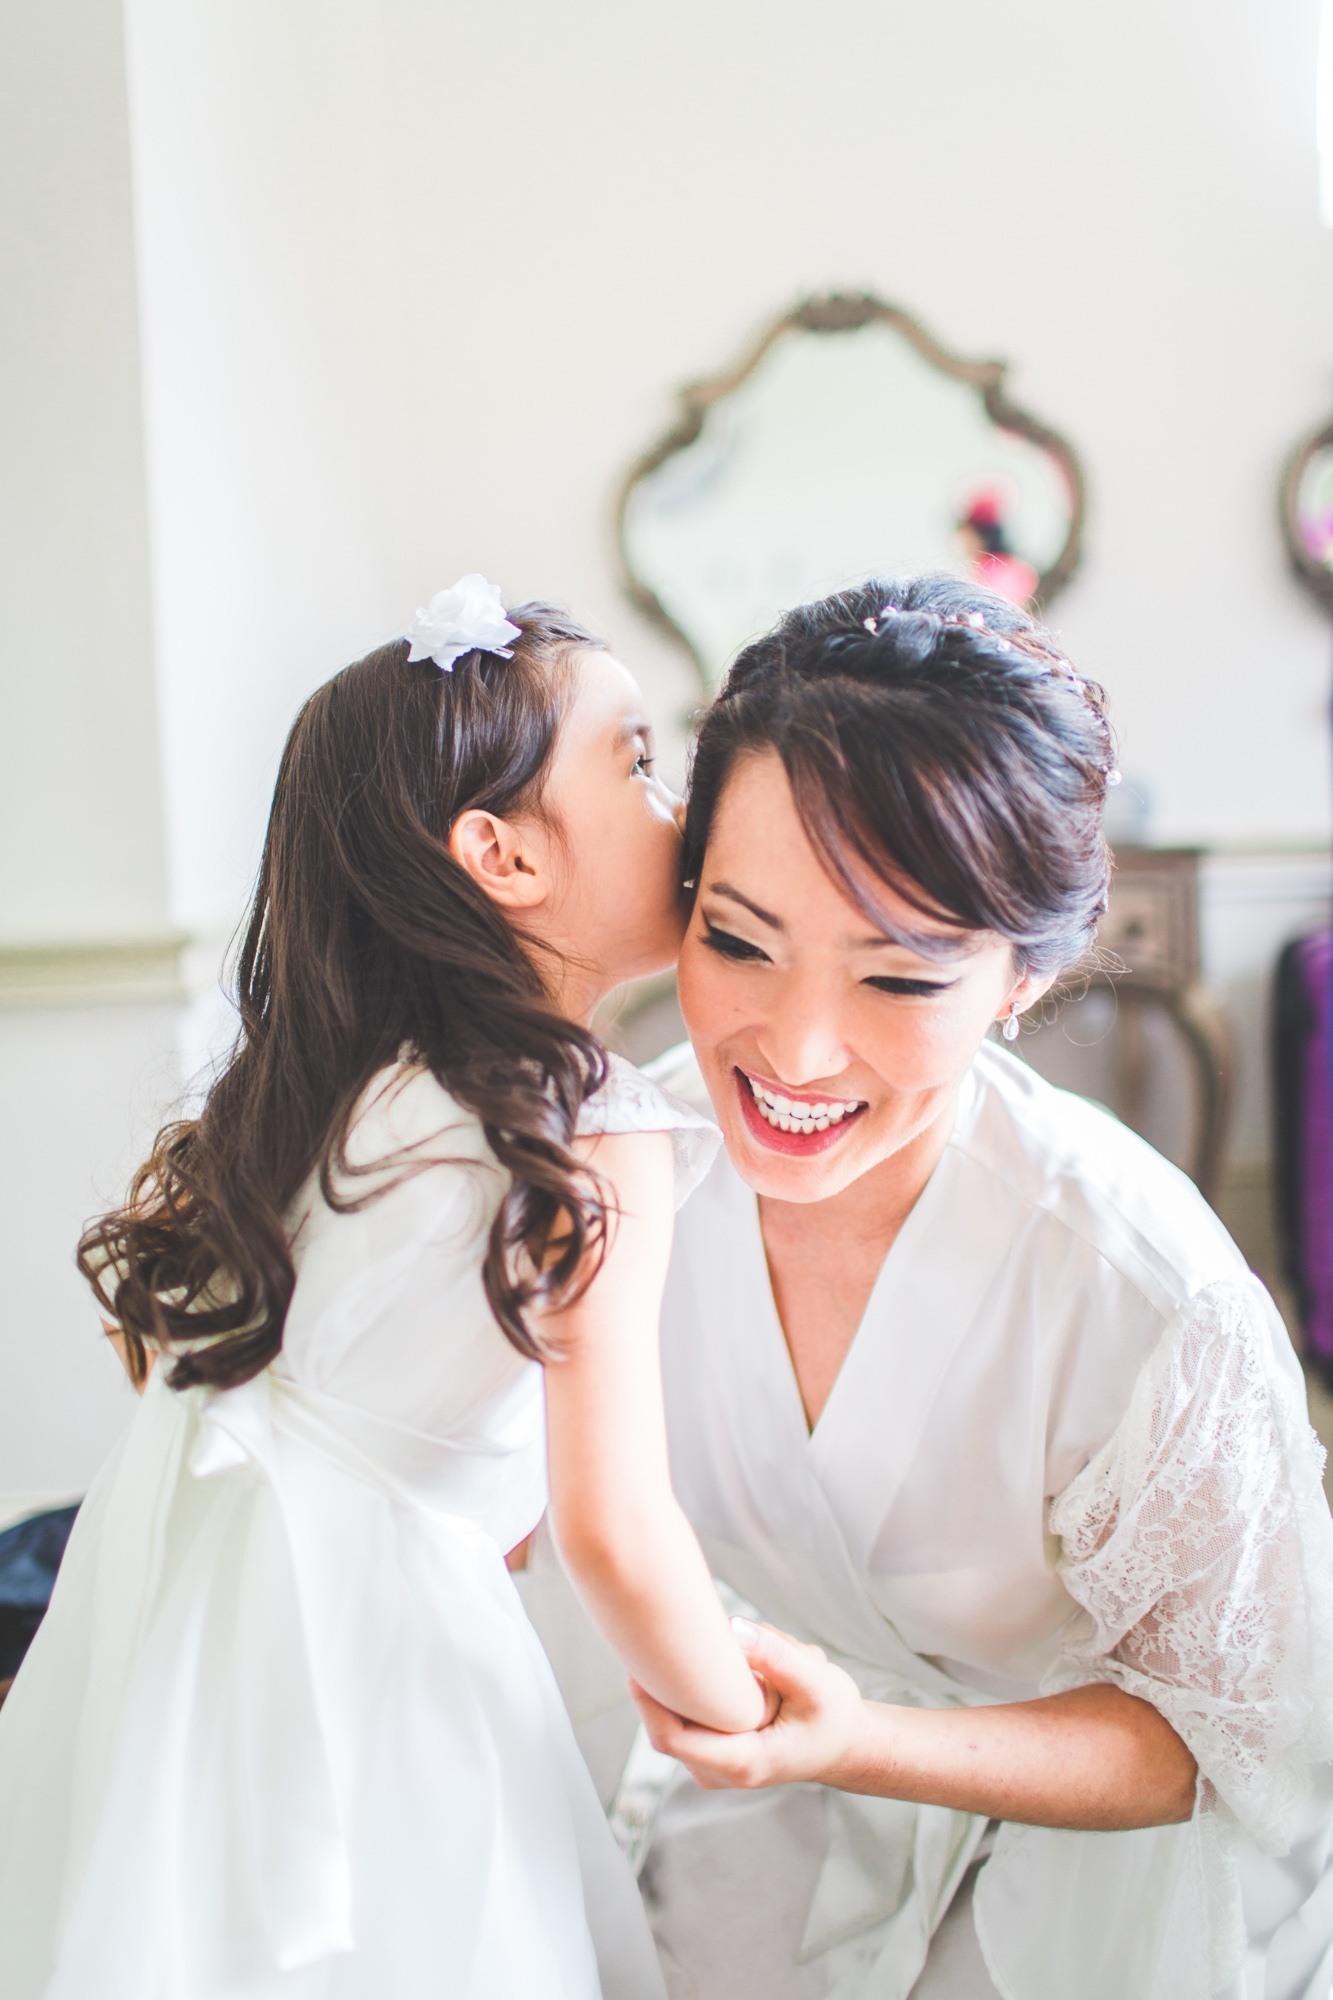 hair wedding makeup bridal beauty bride mature oriental brides runway looks copy absolutely weddings mother stylist perfect kii